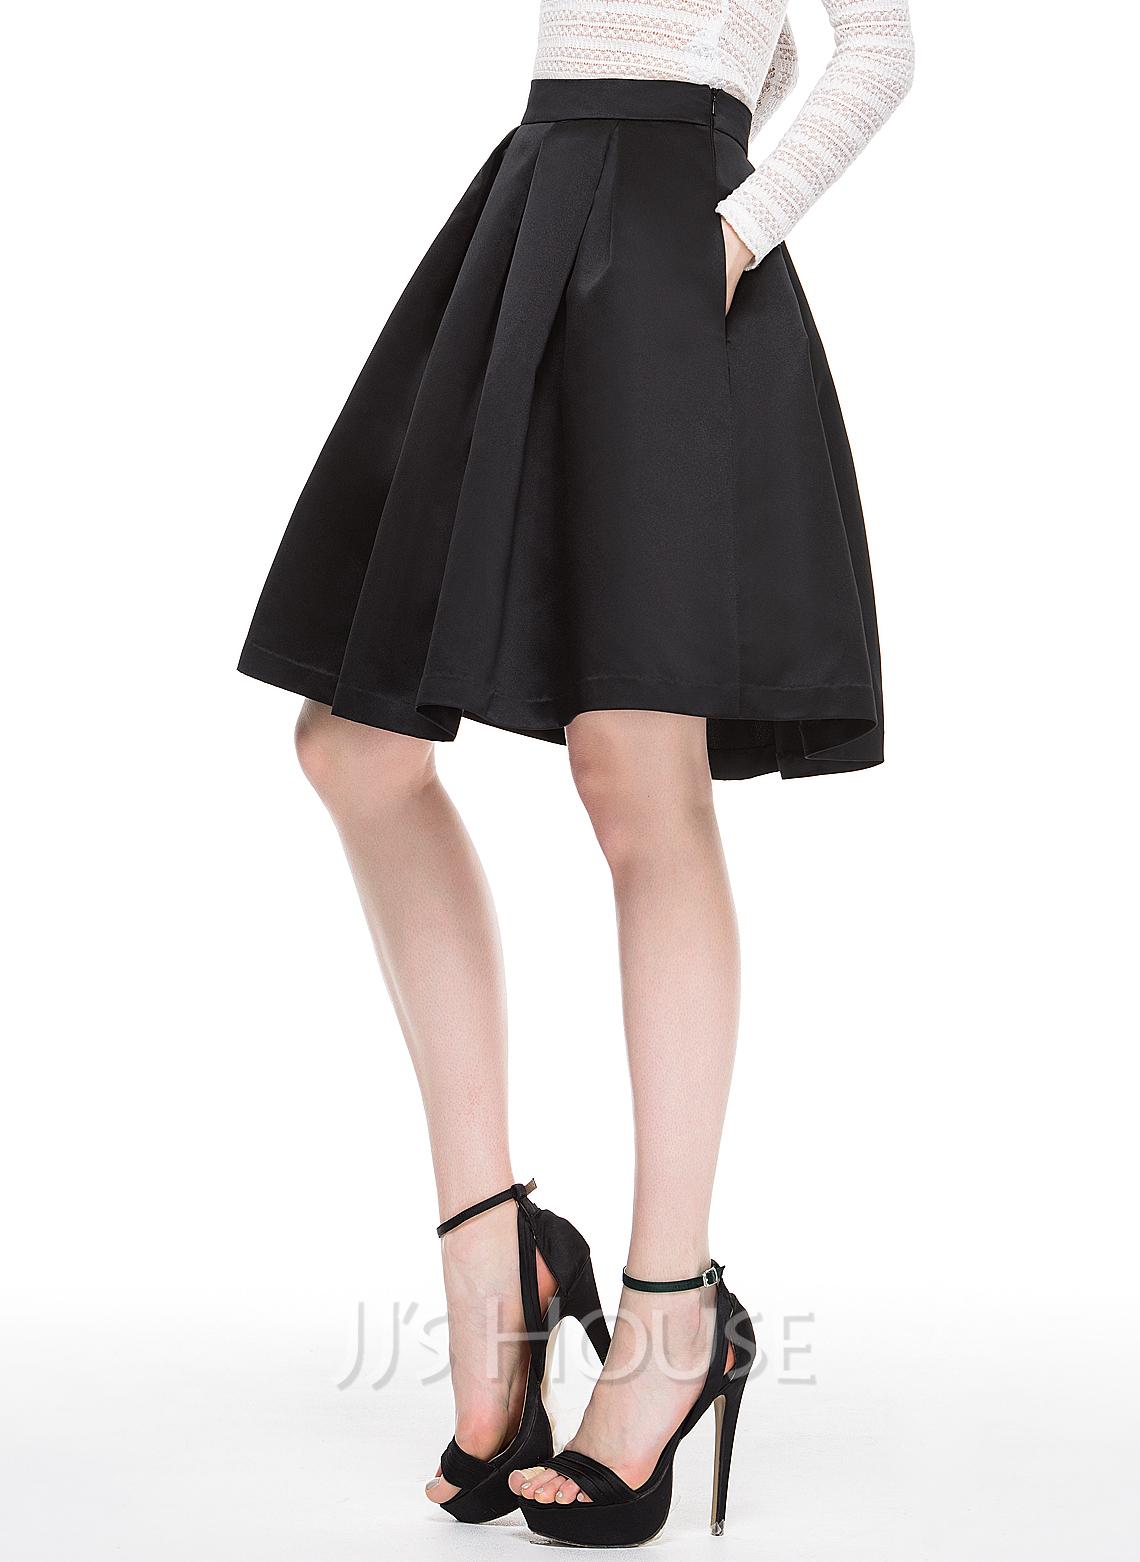 A-Line/Princess Knee-Length Satin Cocktail Skirt